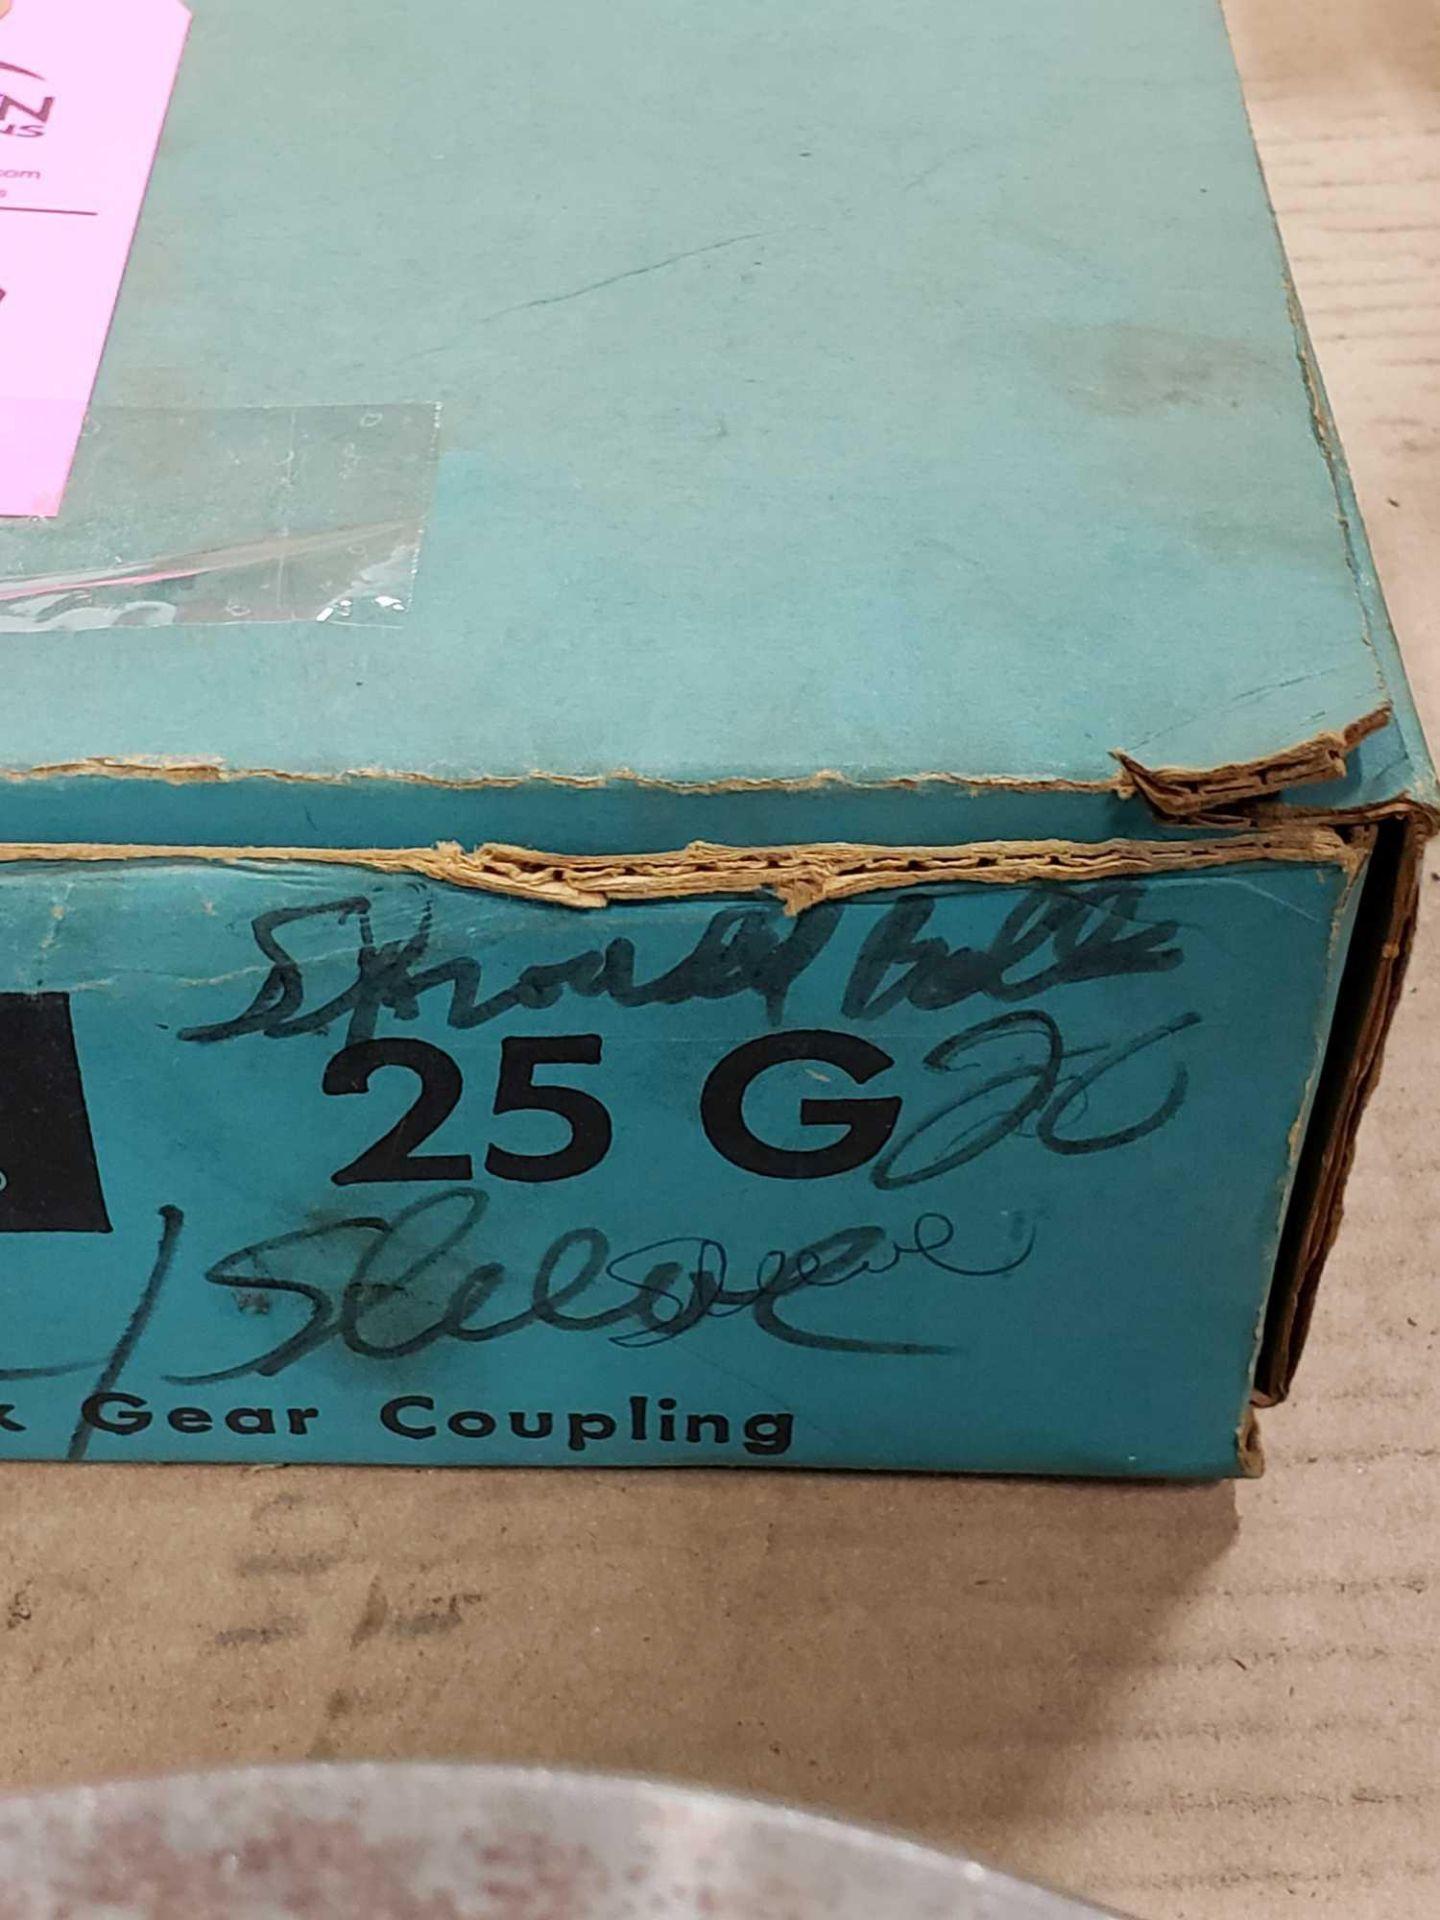 Lot 59 - Falk coupling model 25G20. New in box.